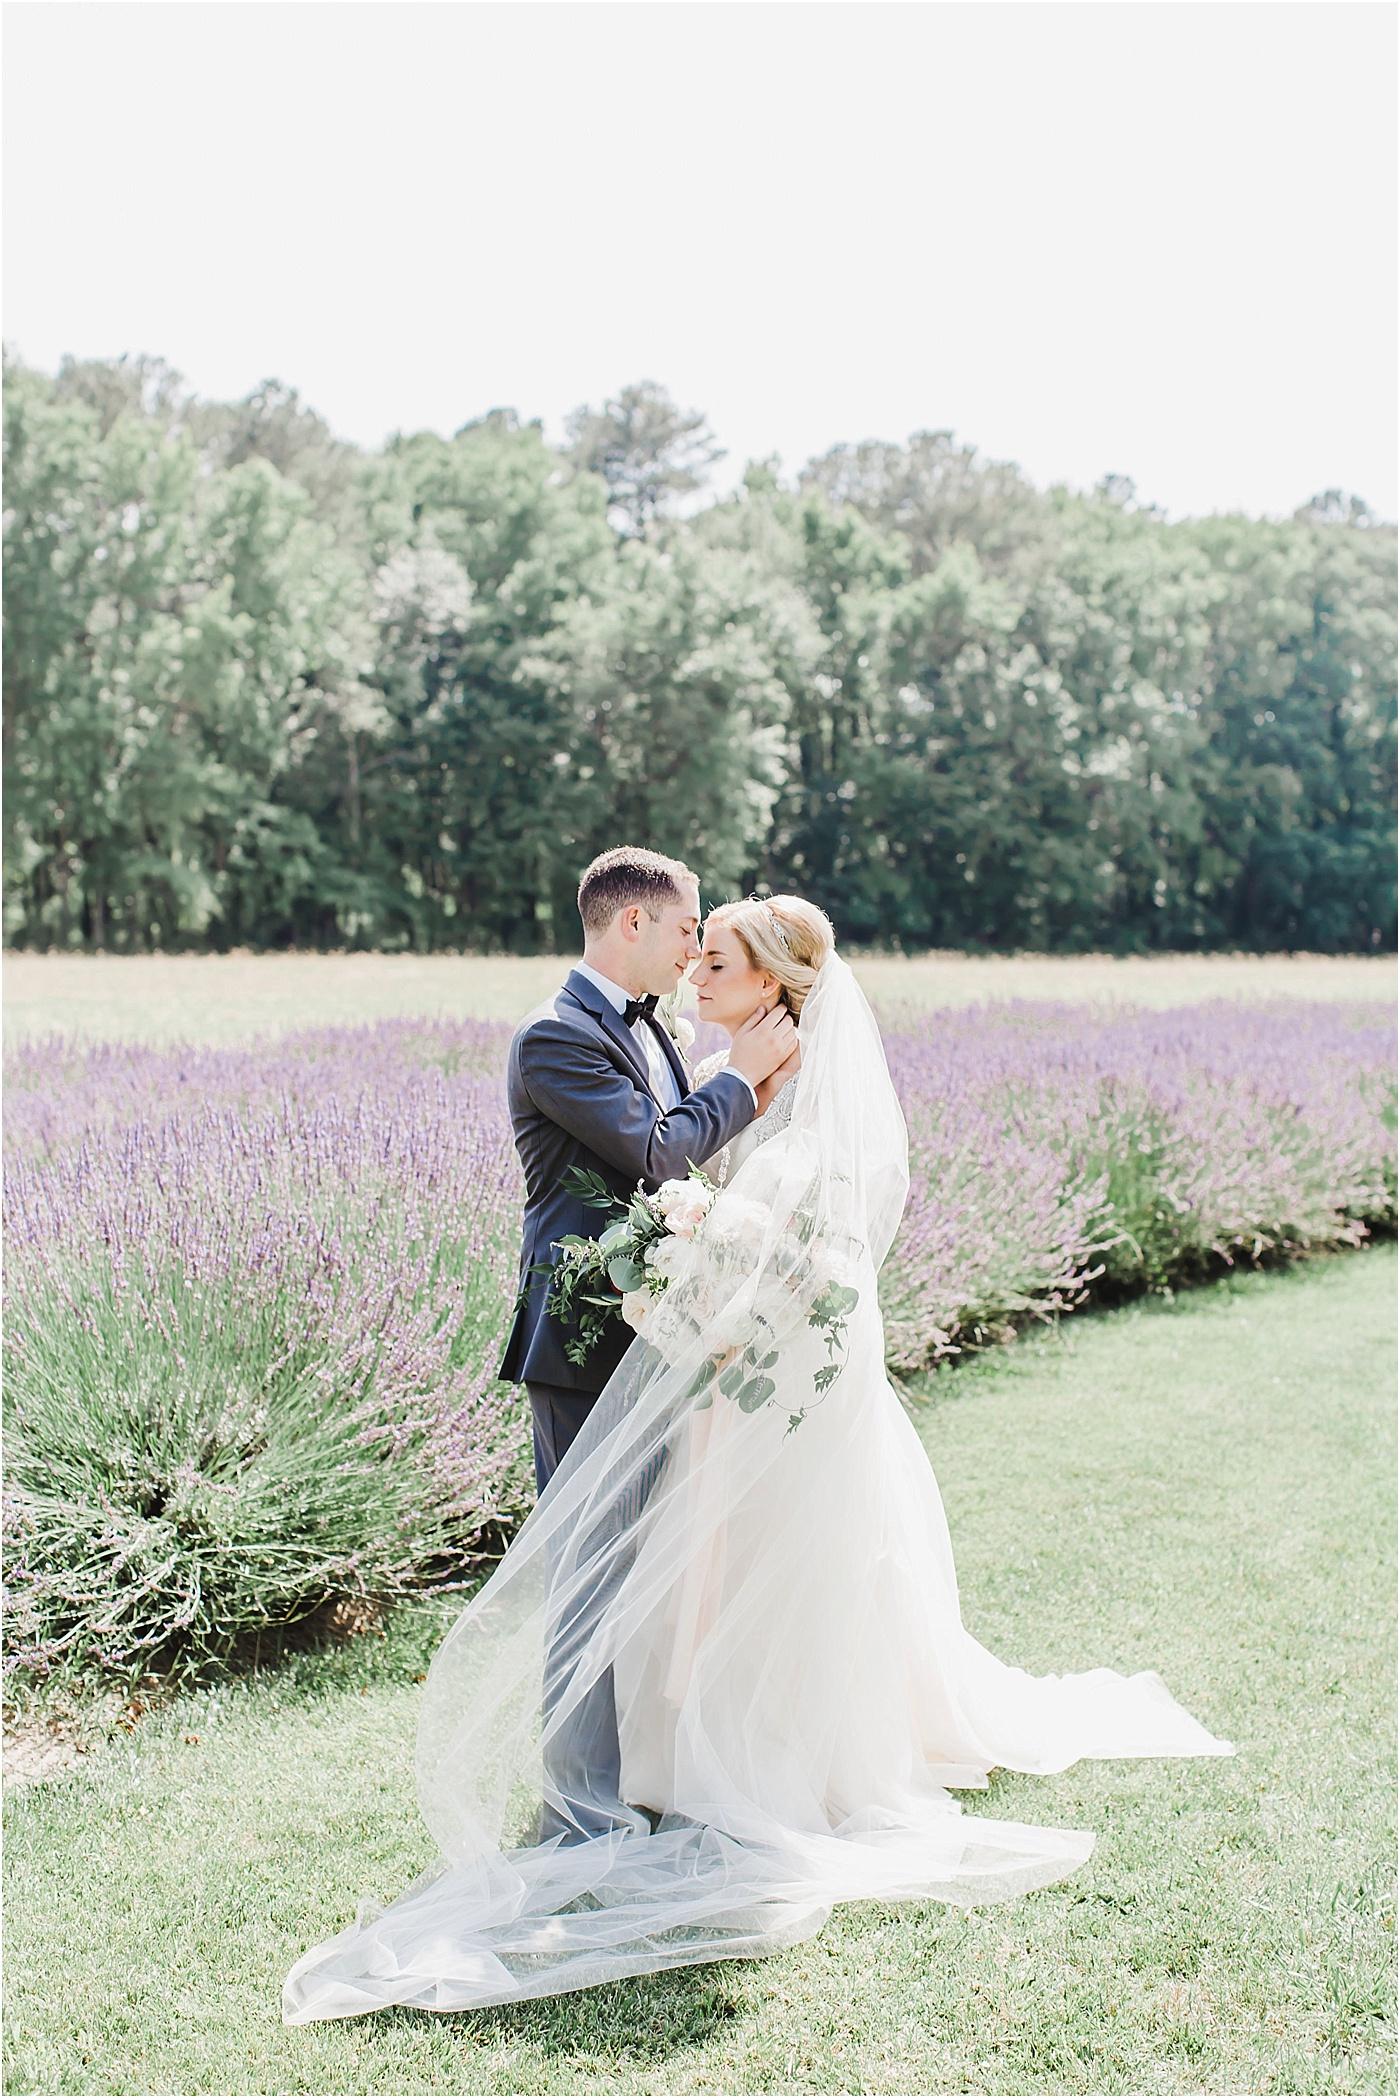 Lavender Inspired Eastern Shore of Maryland Wedding